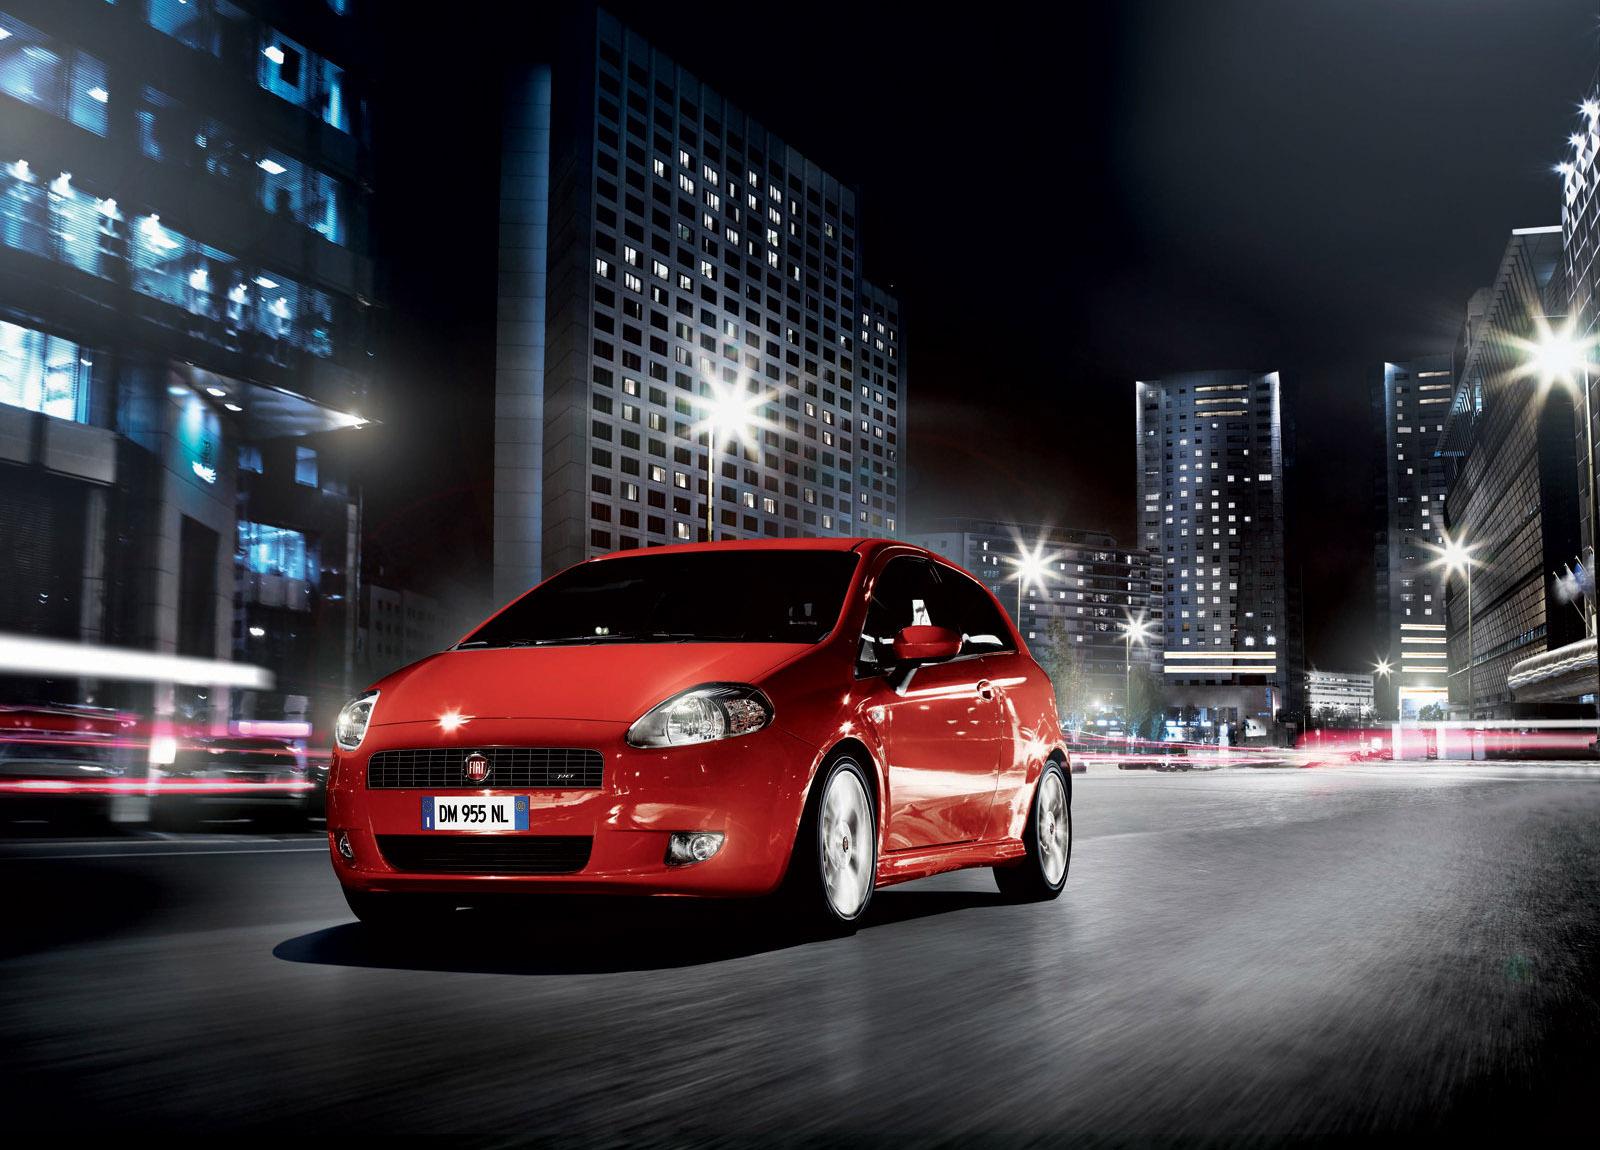 Fiat Grande Punto photo #1